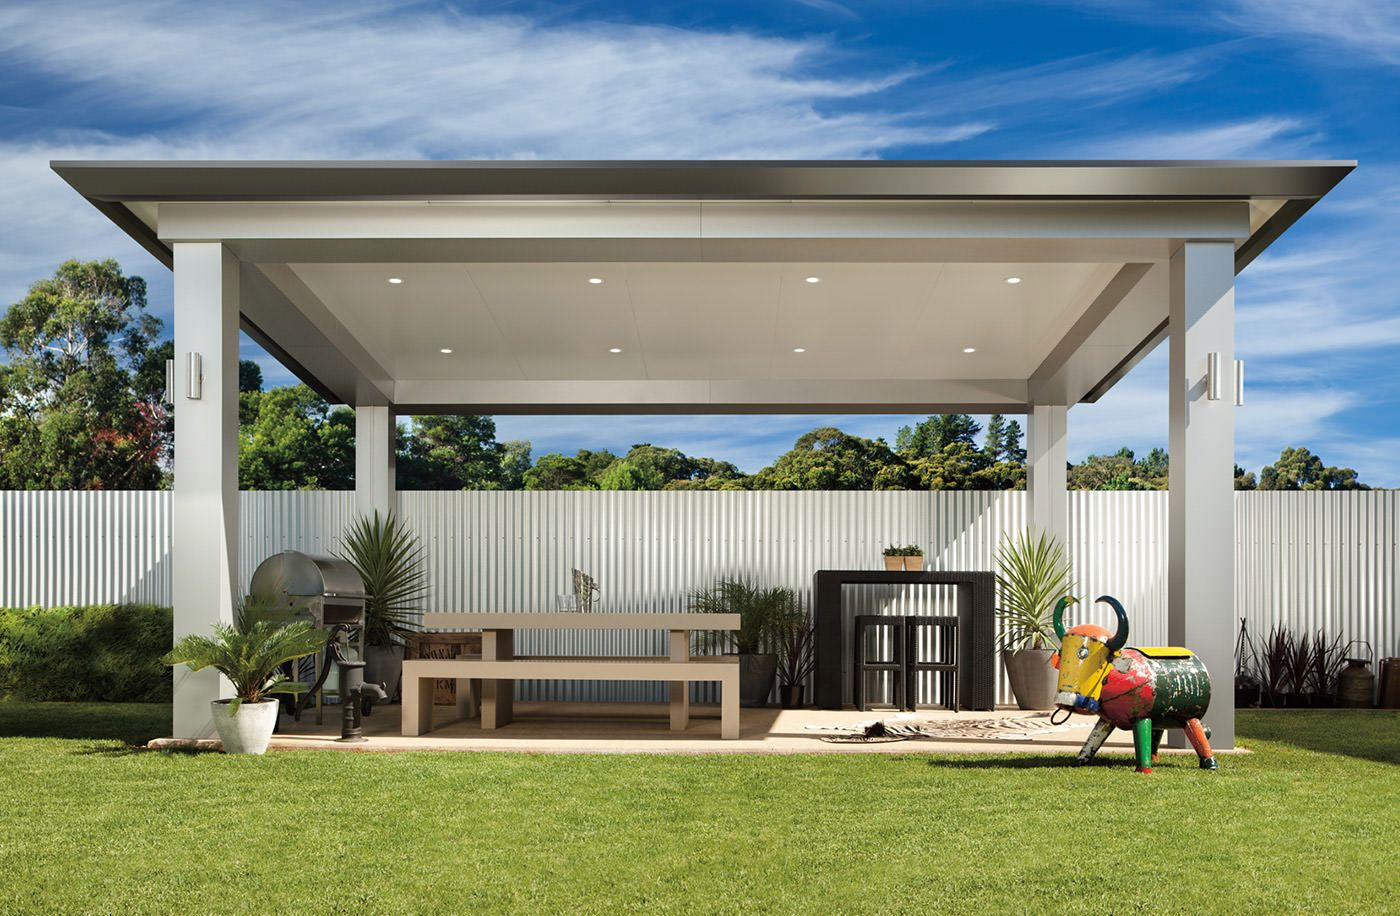 Pavillon Regenschutz Sammlung : Stratco pavilion outdoor pinterest